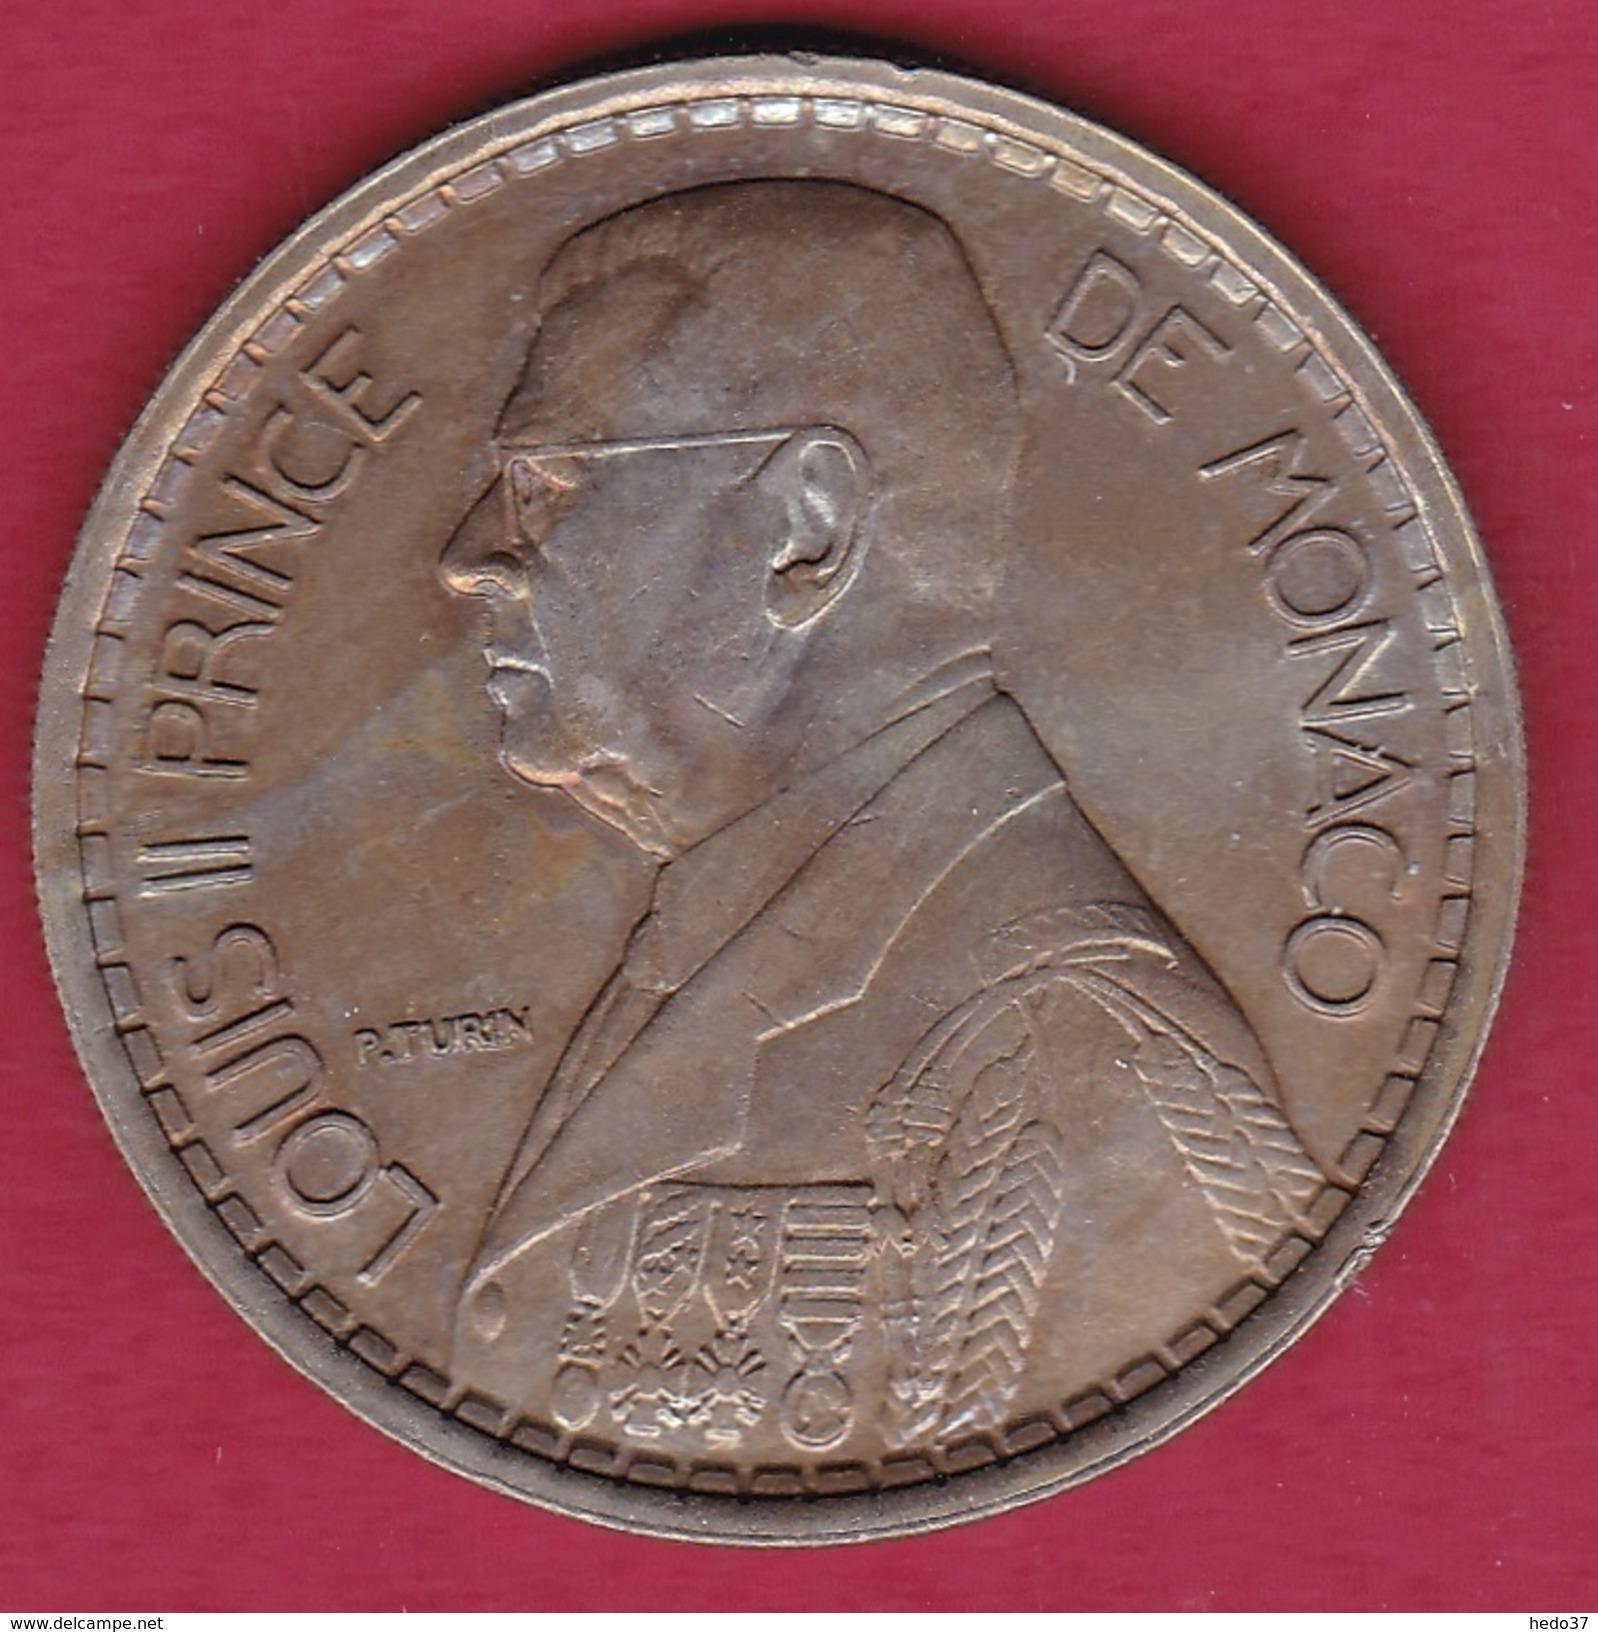 Monaco - Louis II - 20 Francs - 1947 - SUP - Monaco